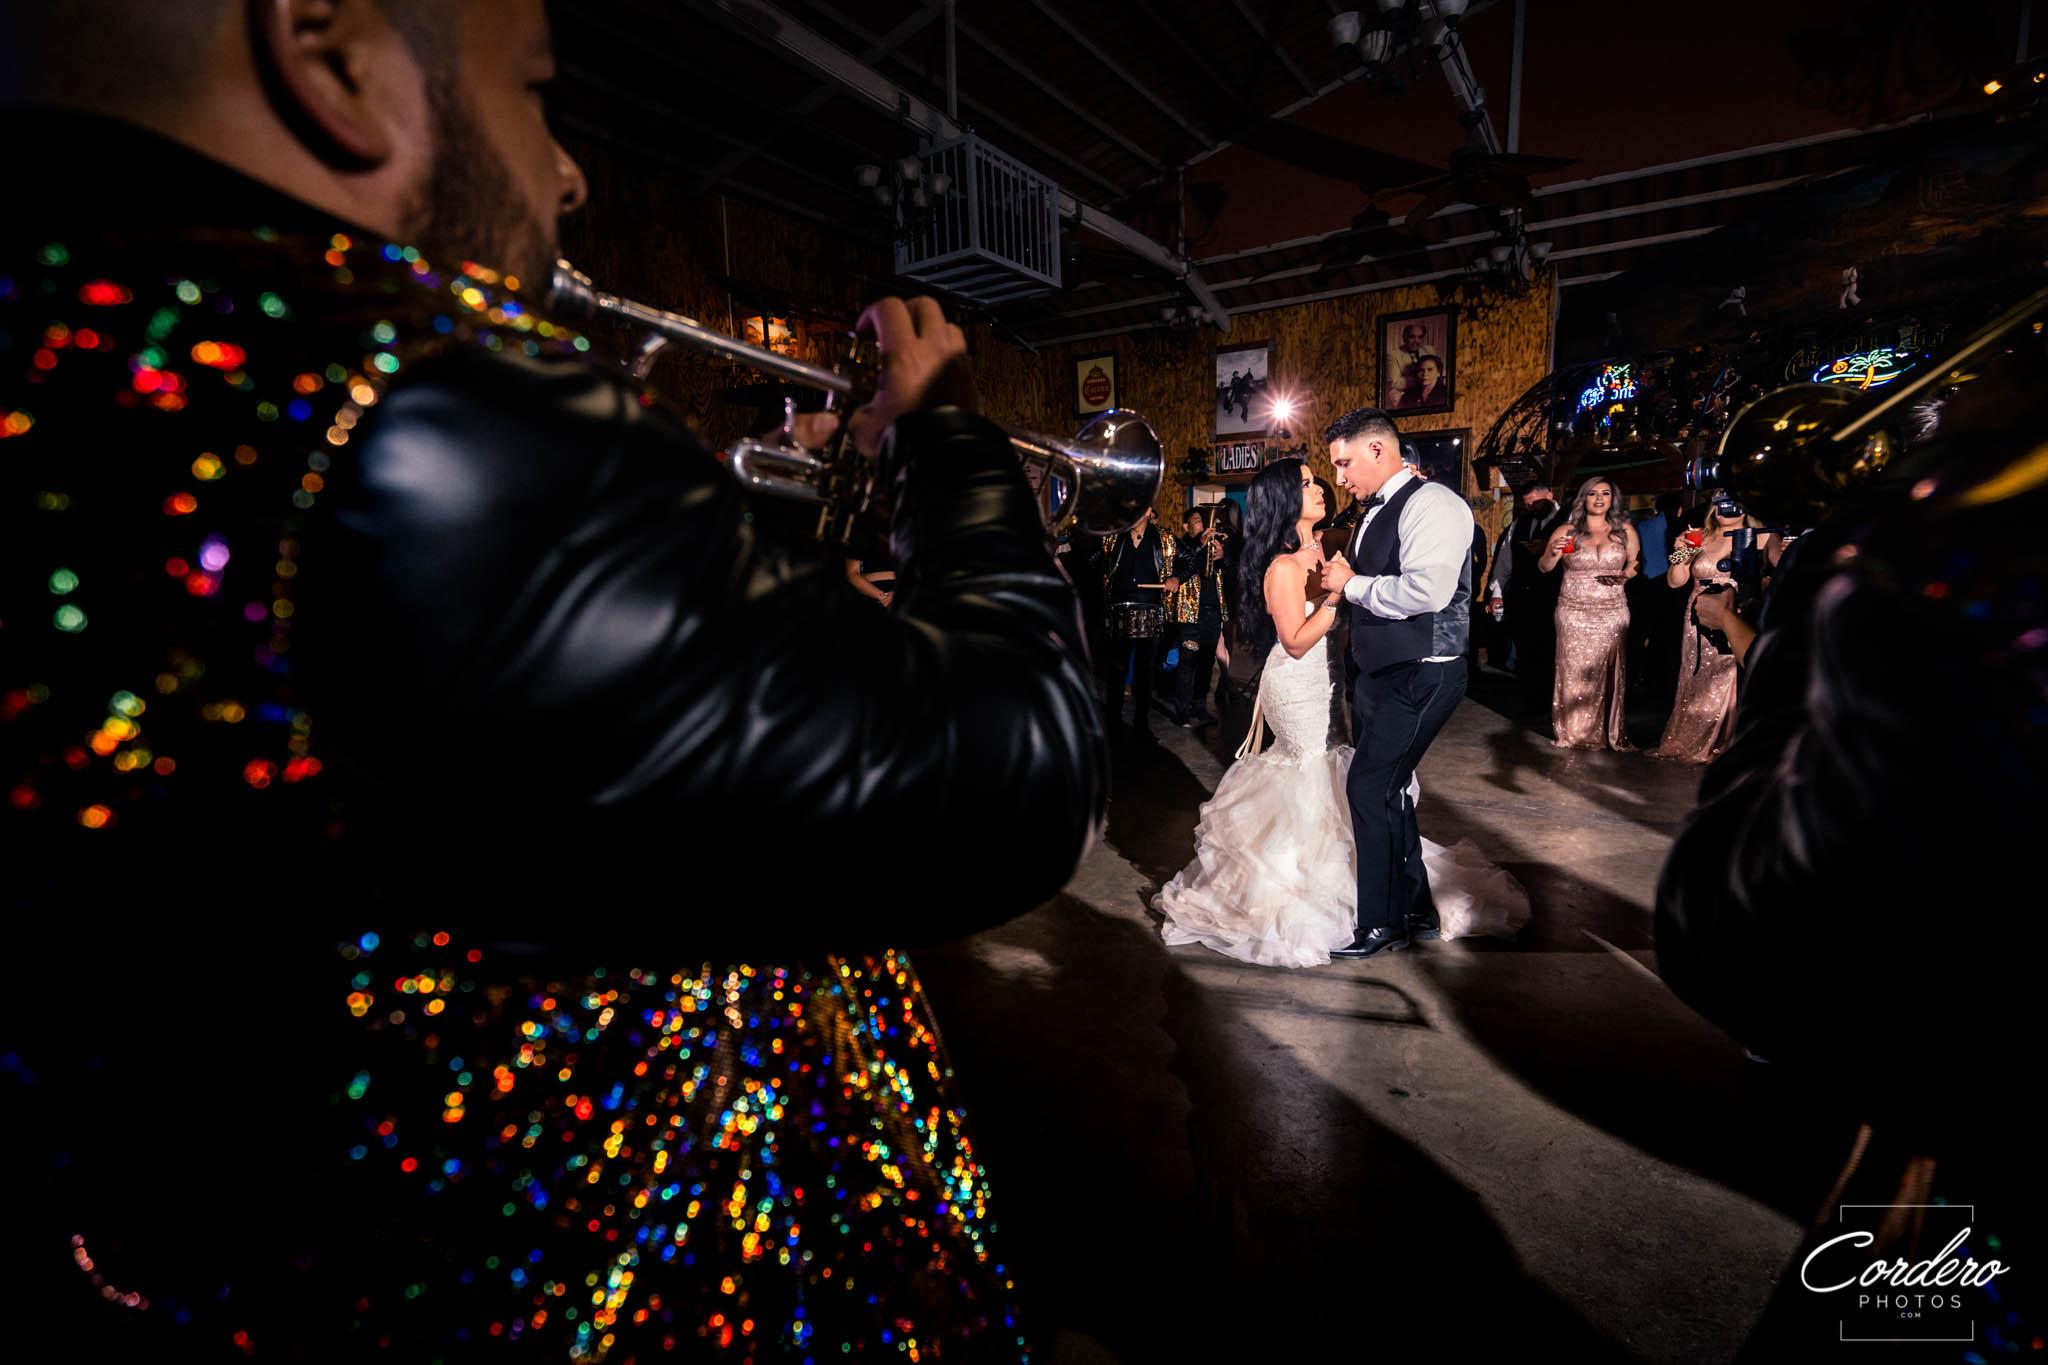 Andrea-and-Valentin-Wedding-WEB-07921.jpg